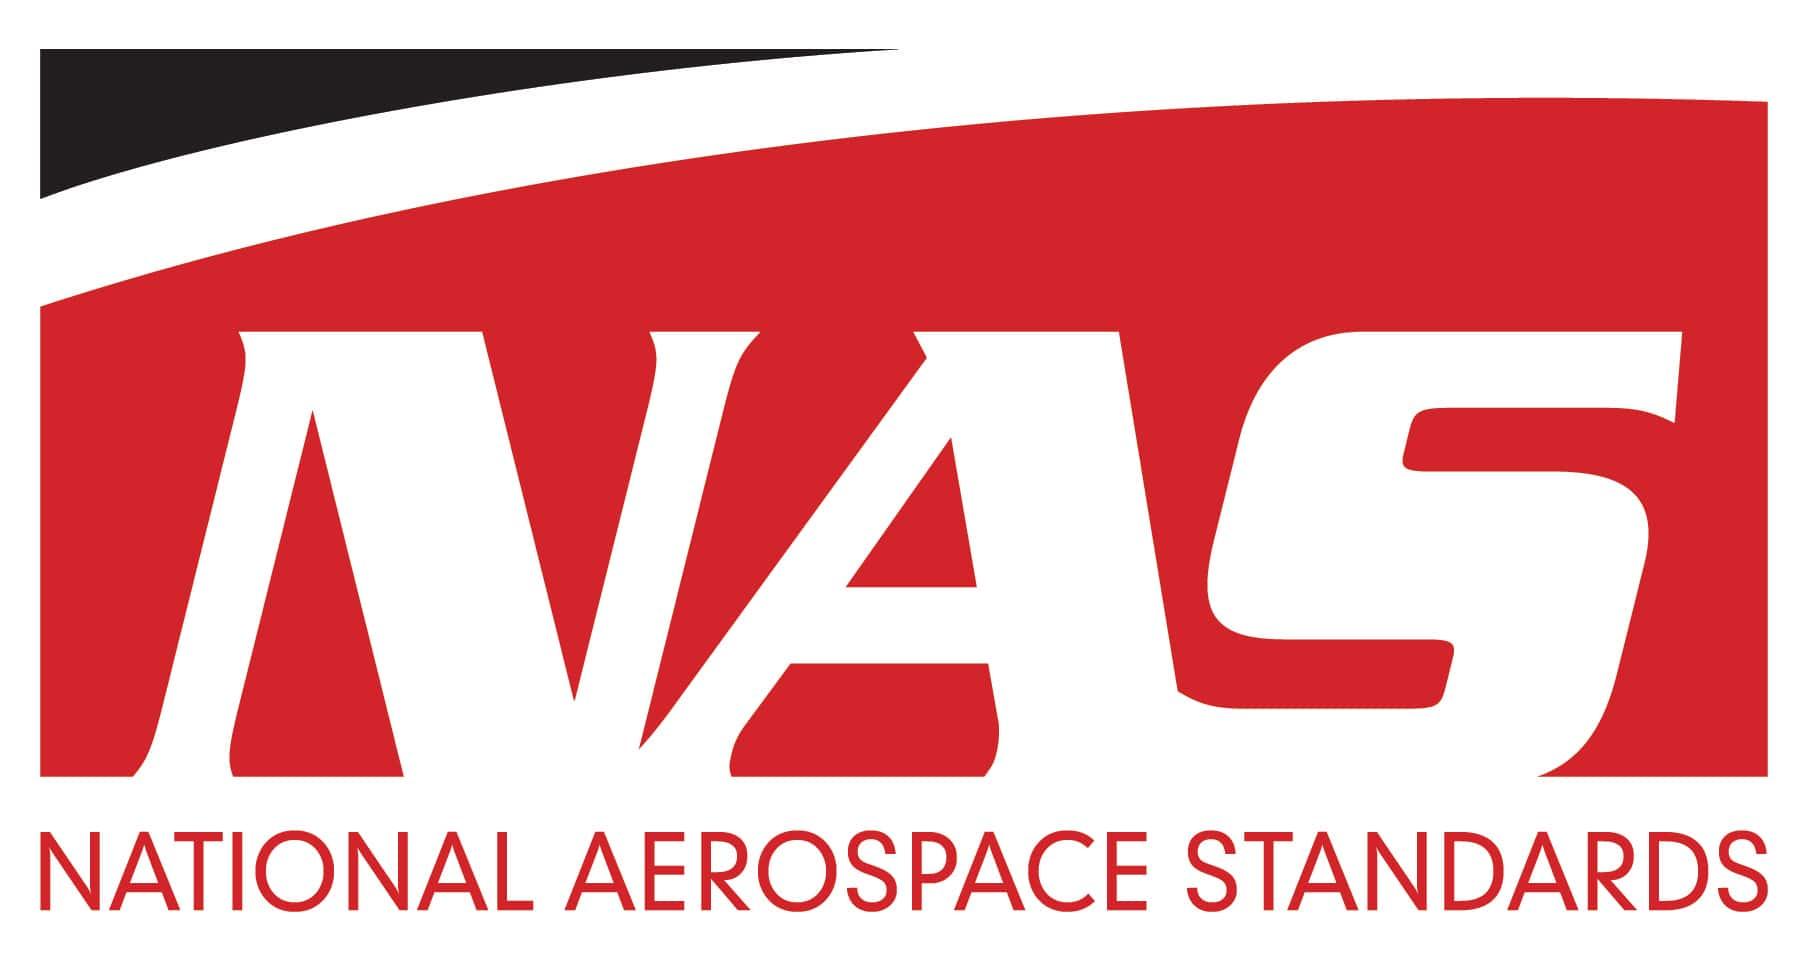 National Aerospace Standards